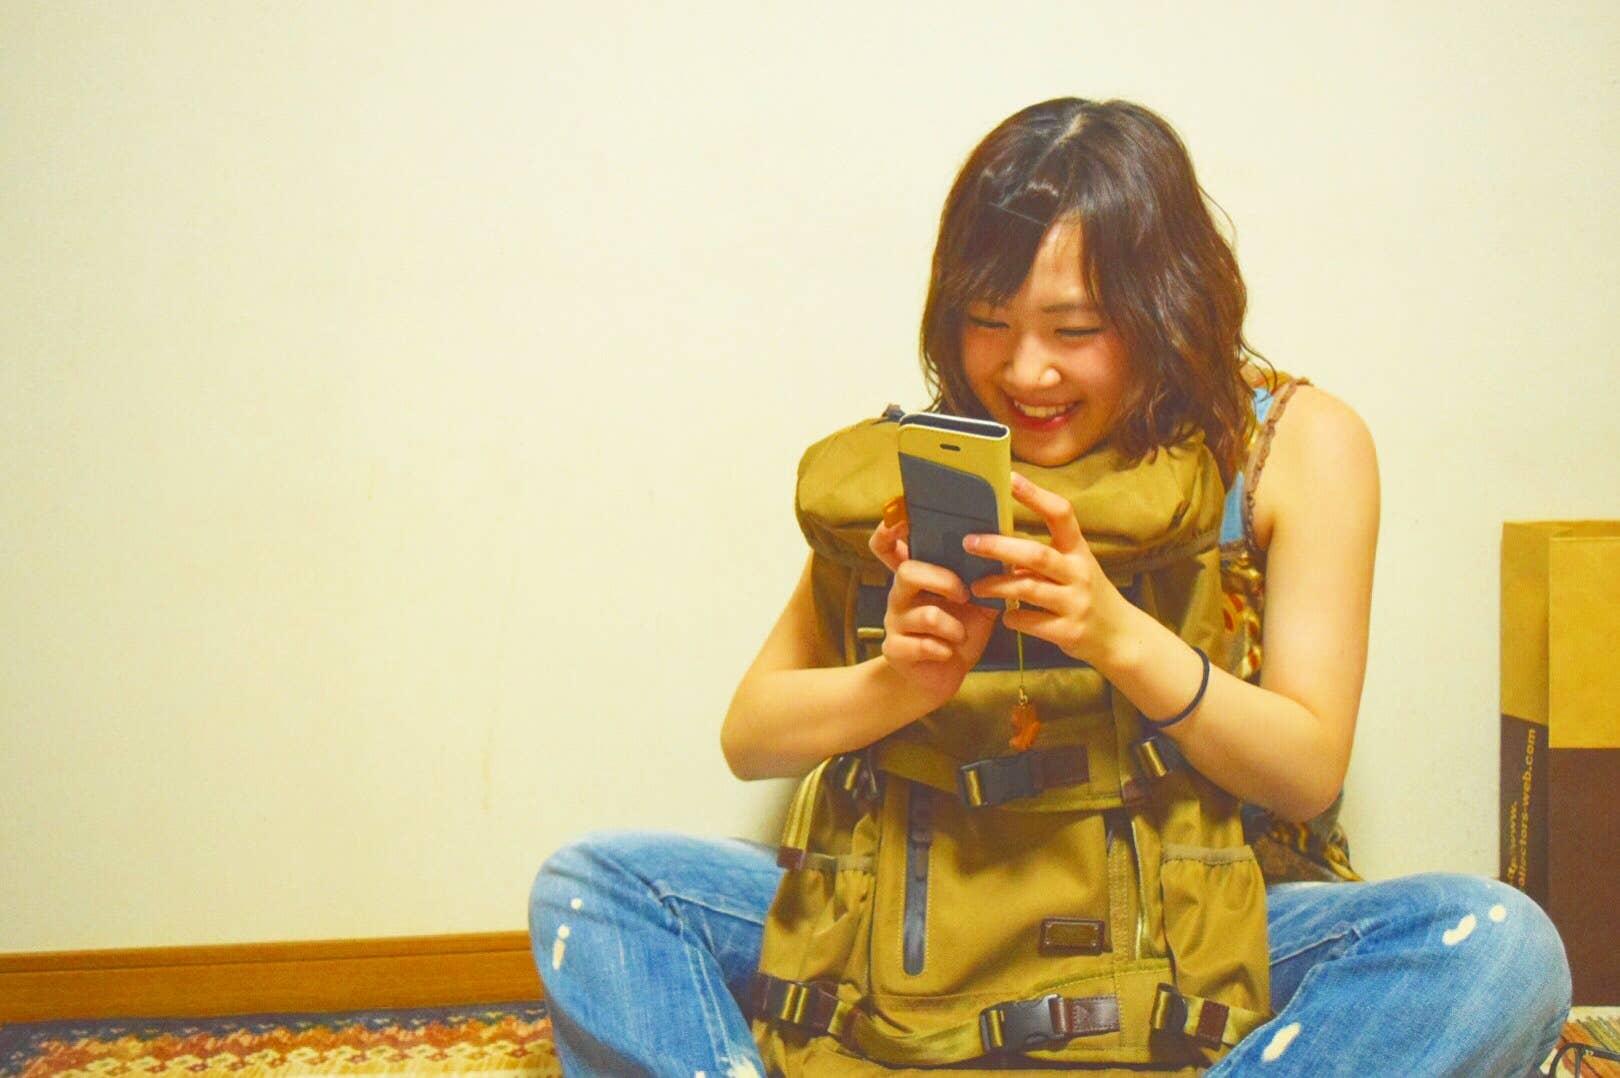 Nanami Sasaki